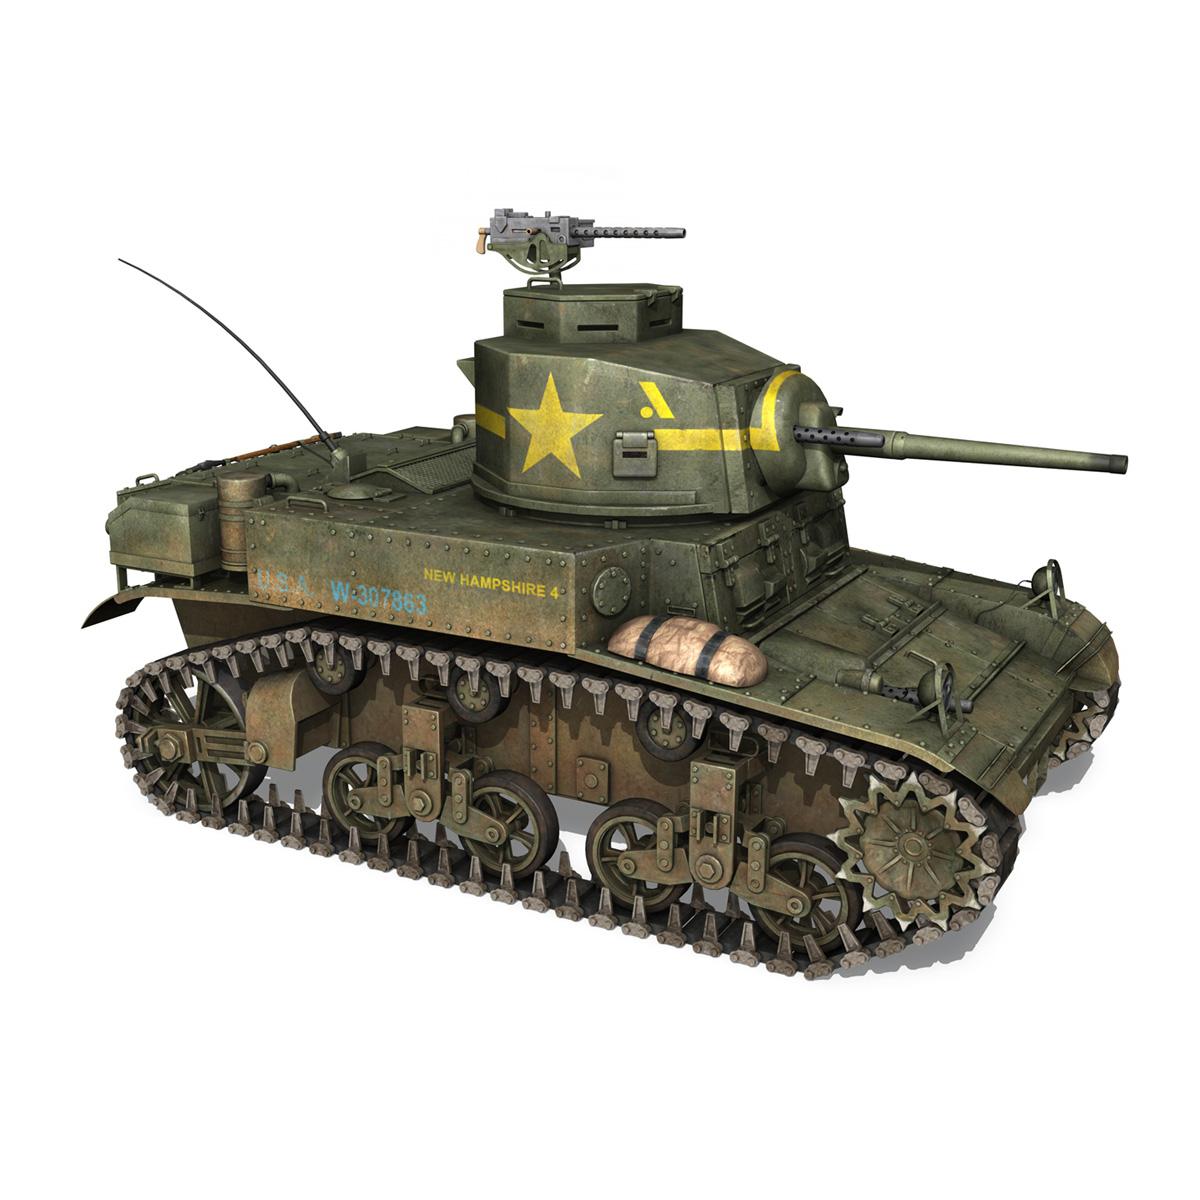 m3 light tank stuart – new hampshire 4 3d model 3ds c4d fbx lwo lw lws obj 266379